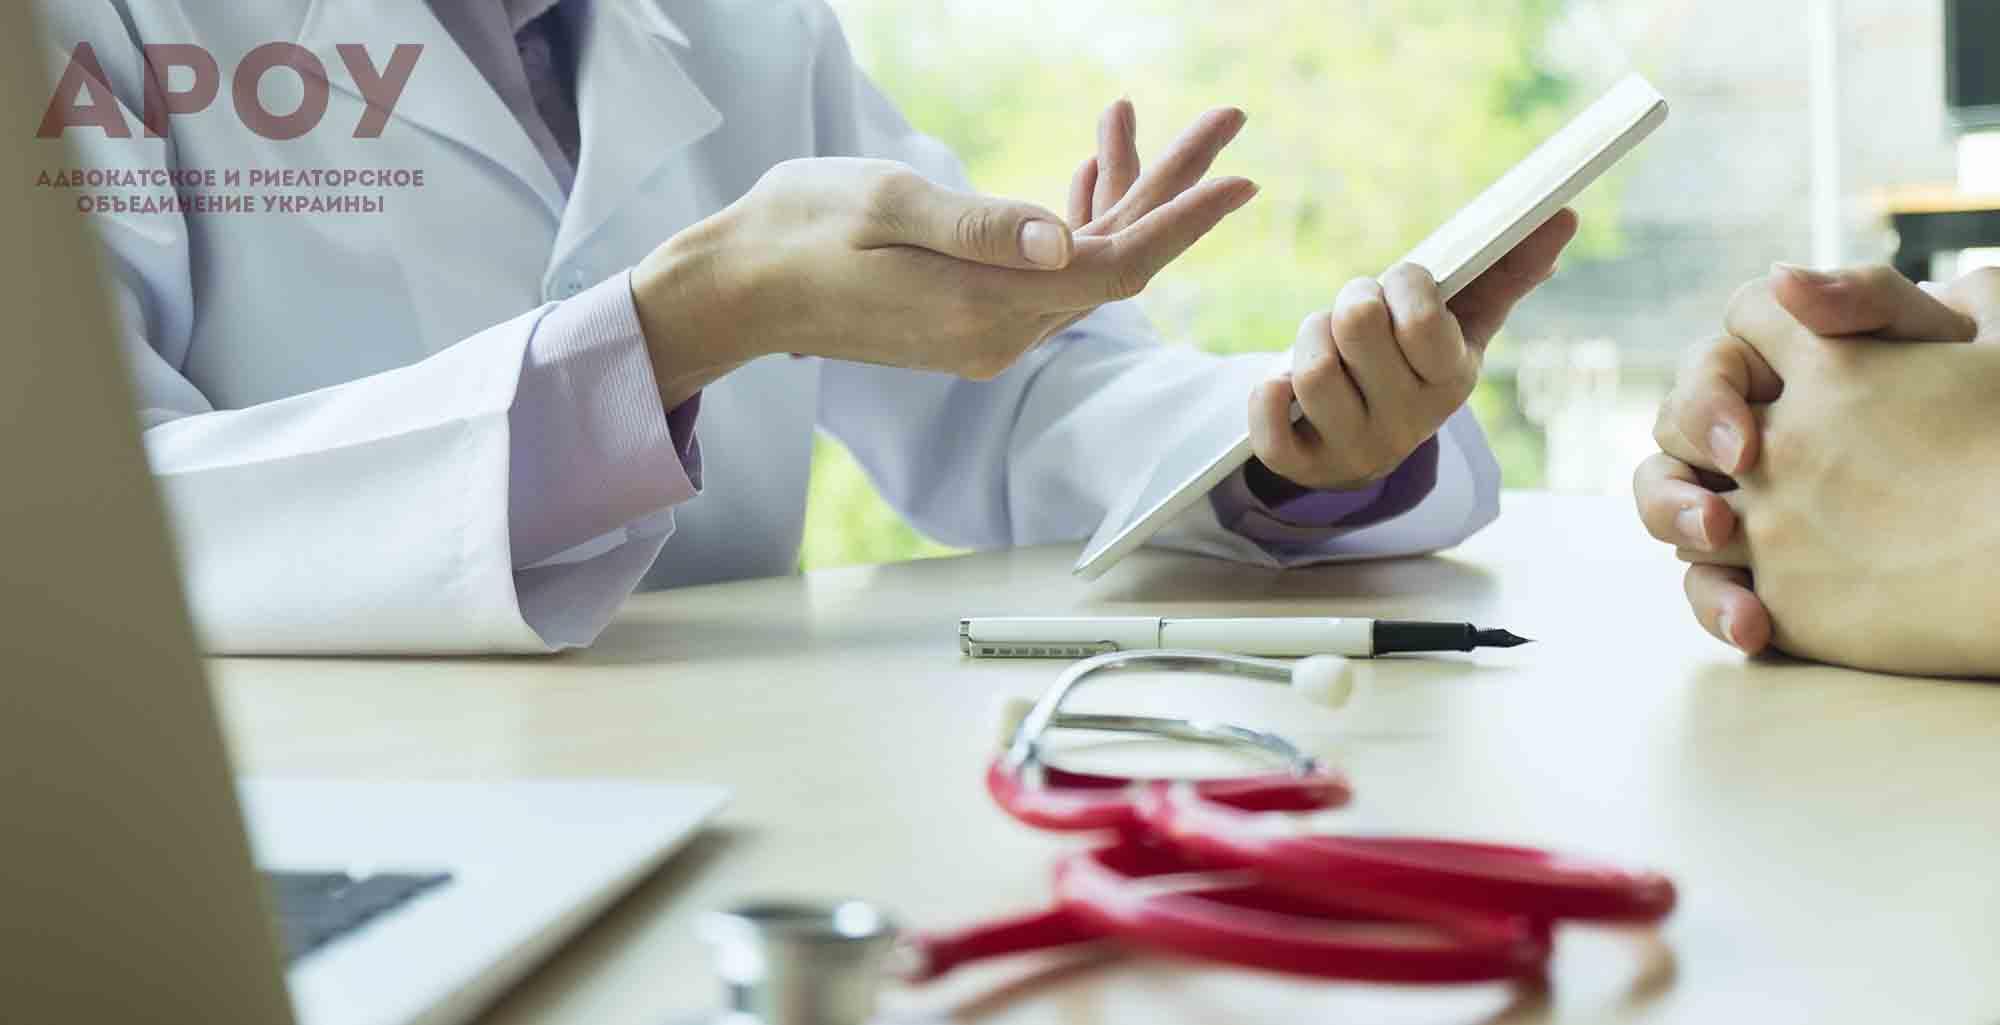 услуги медицинского адвоката в киеве - адвокат по медицинским делам